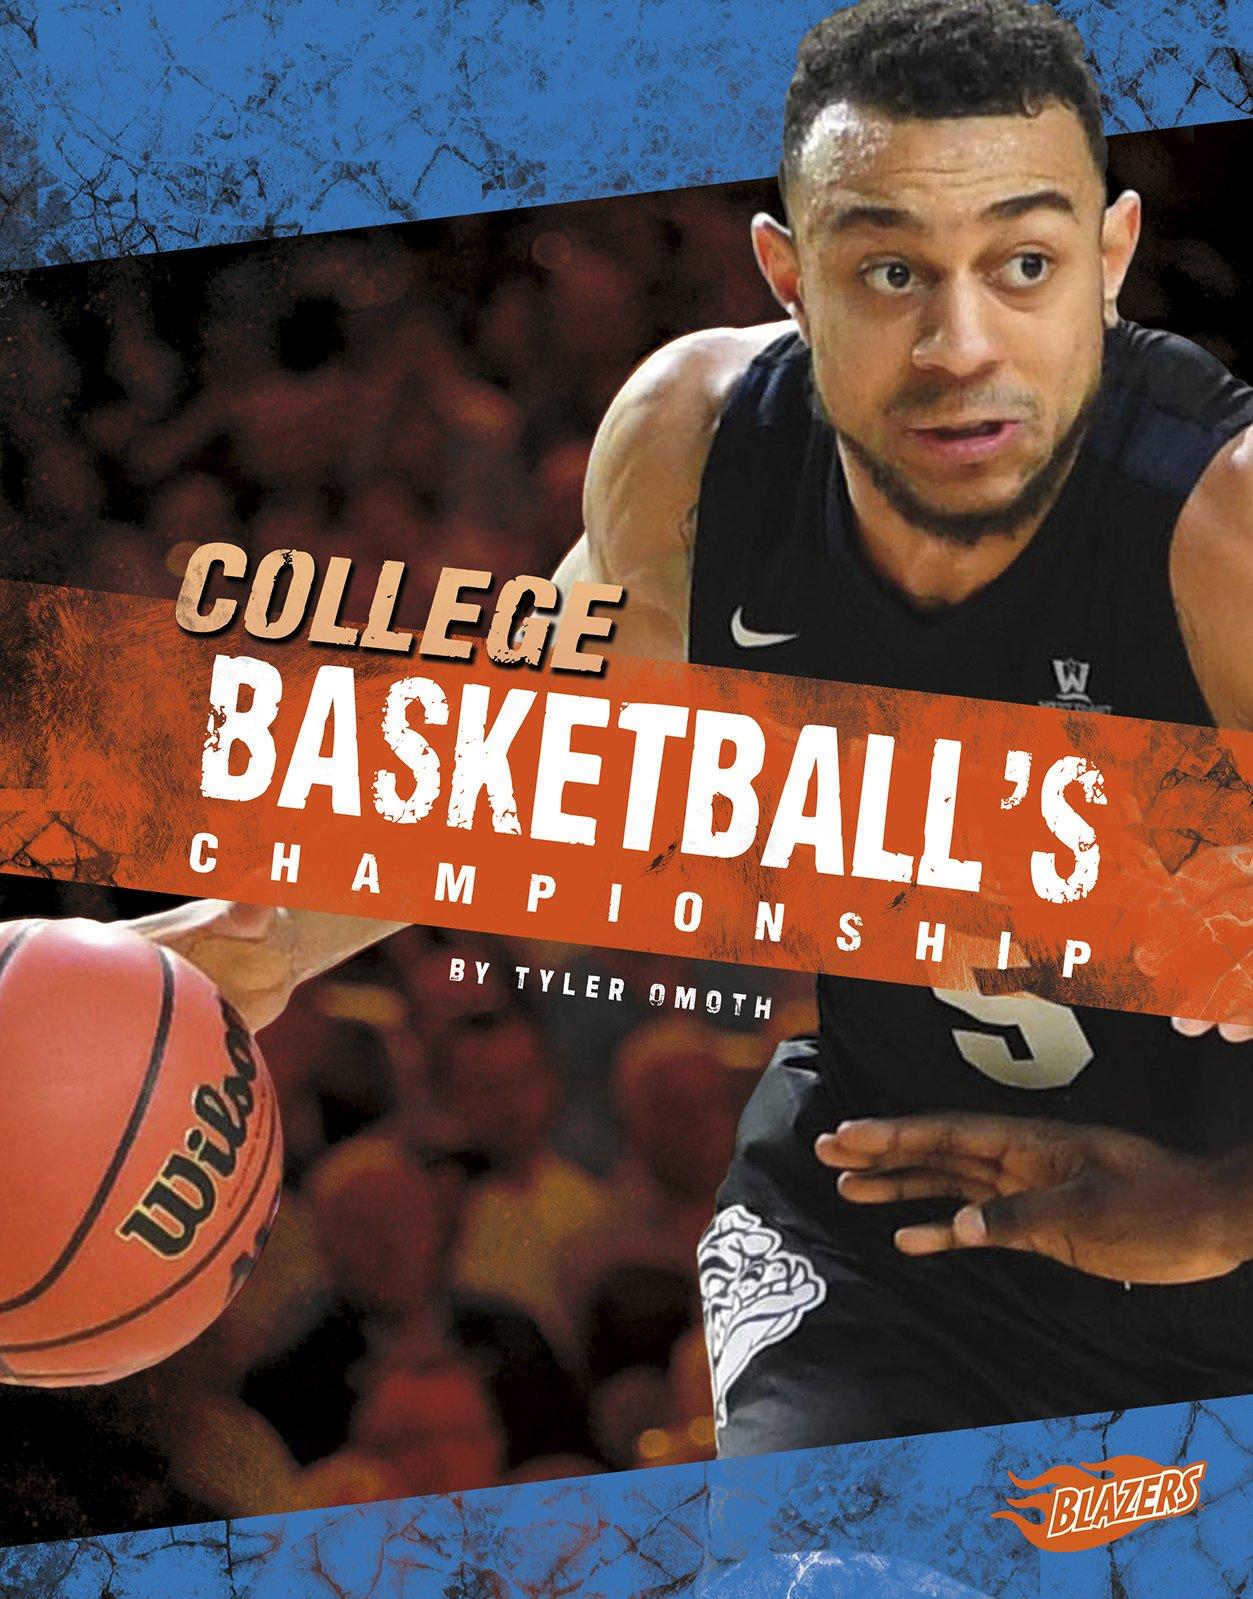 College Basketball'sChampionship (Major Sports Championships)